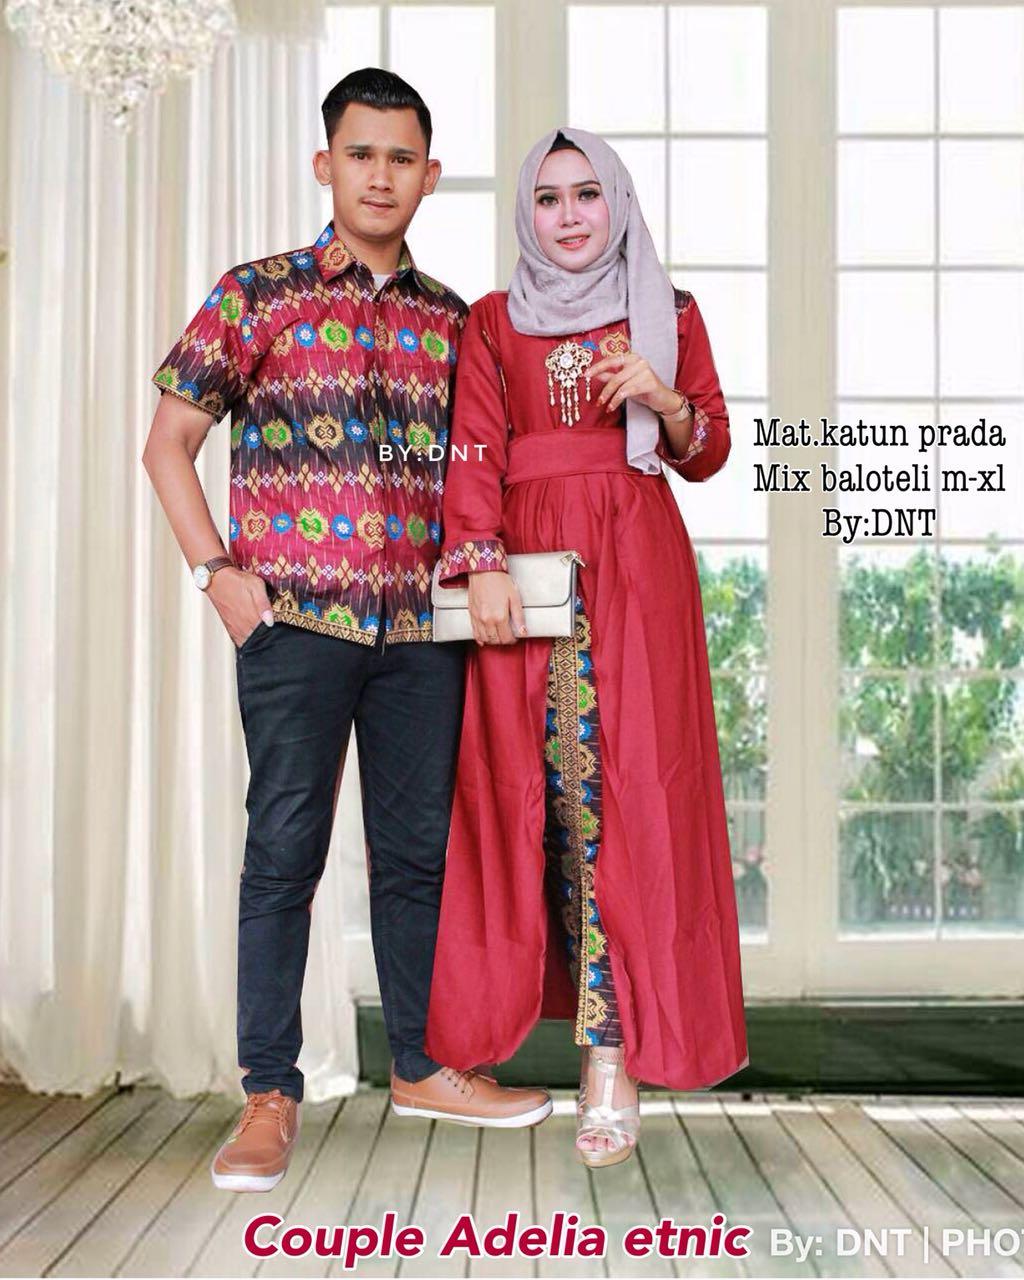 Viollyne Shop Sarimbit Adelia Etnict Fast Respon Order Pin Bbm Batik Couple D732de0f D7c3fde1 Wa 081802501831 085725528202 Fb Arie Sapto Purwidiyanti Ig Ayyu